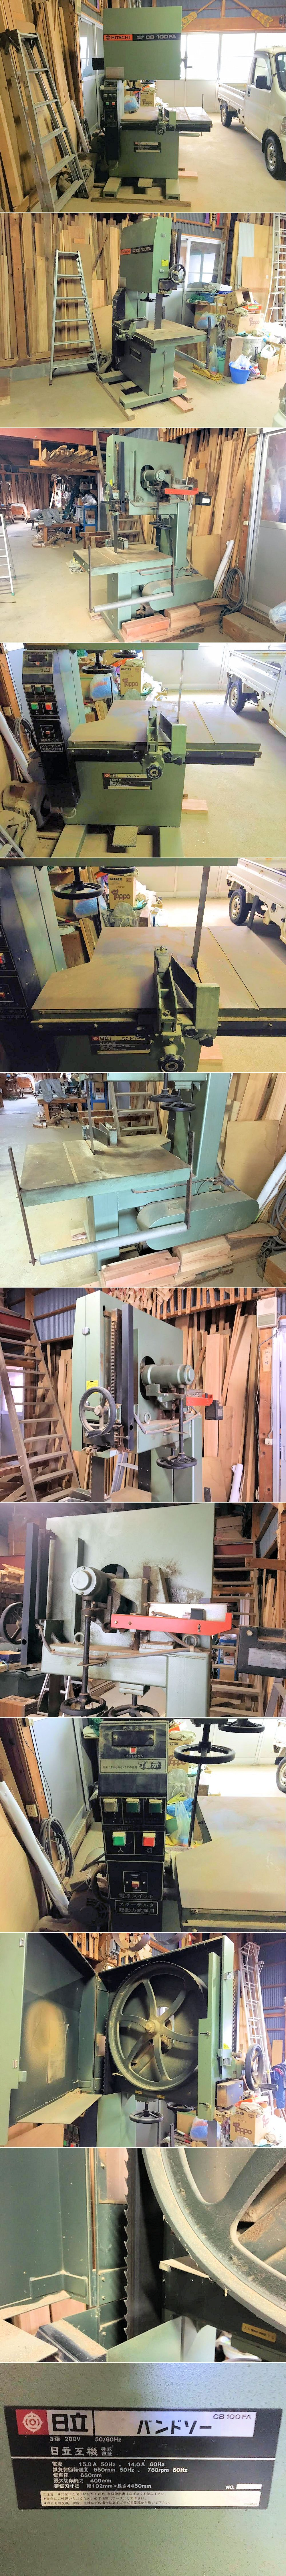 日立 バンドソー CB100FA 三相 200V 製材 大工廃業品 美品 実働品 業務用 木工機械 中古